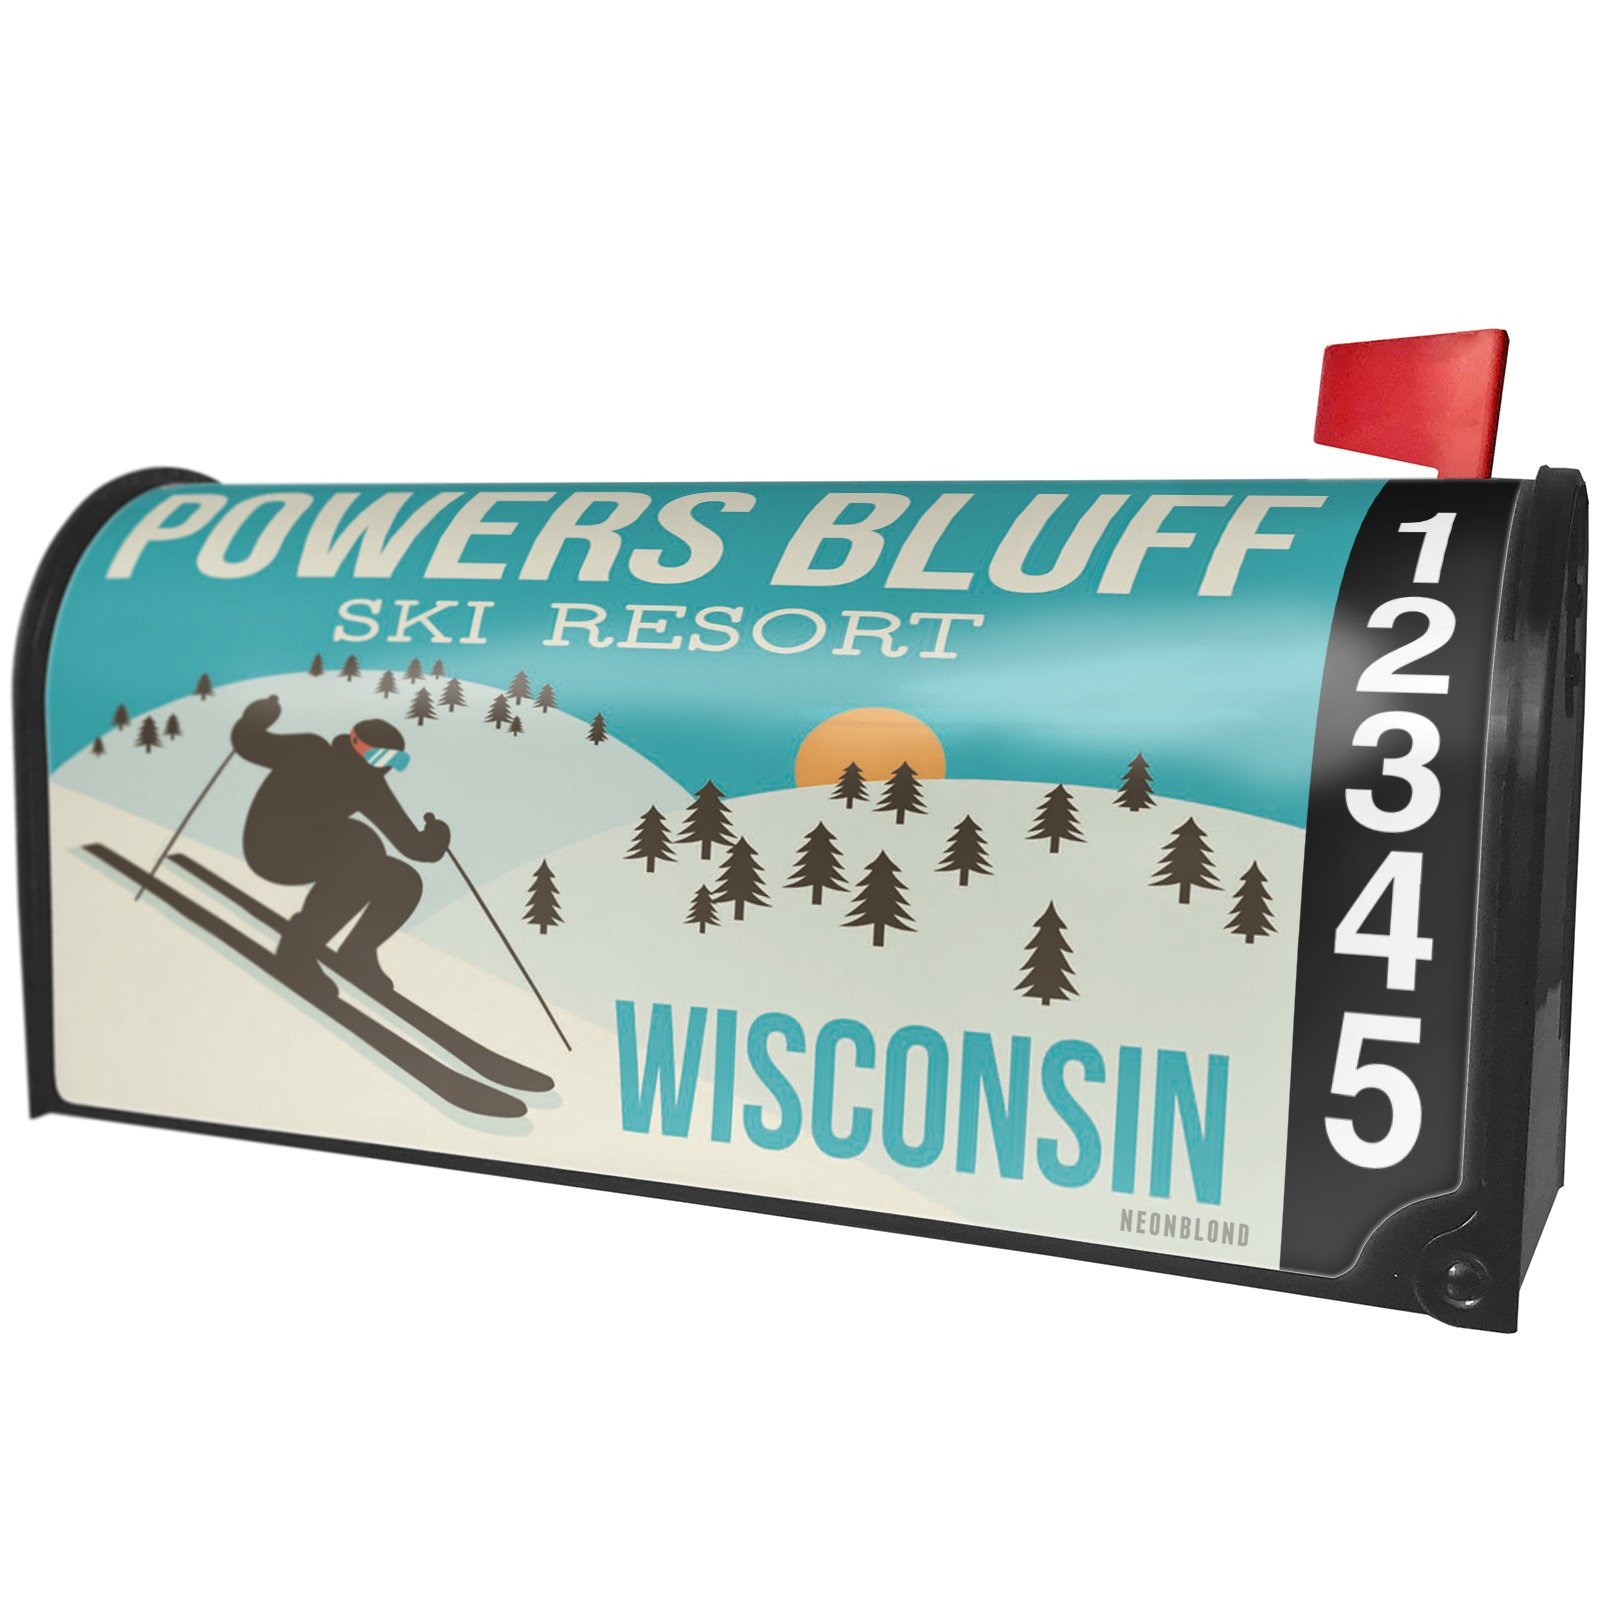 NEONBLOND Powers Bluff Ski Resort - Wisconsin Ski Resort Magnetic Mailbox Cover Custom Numbers